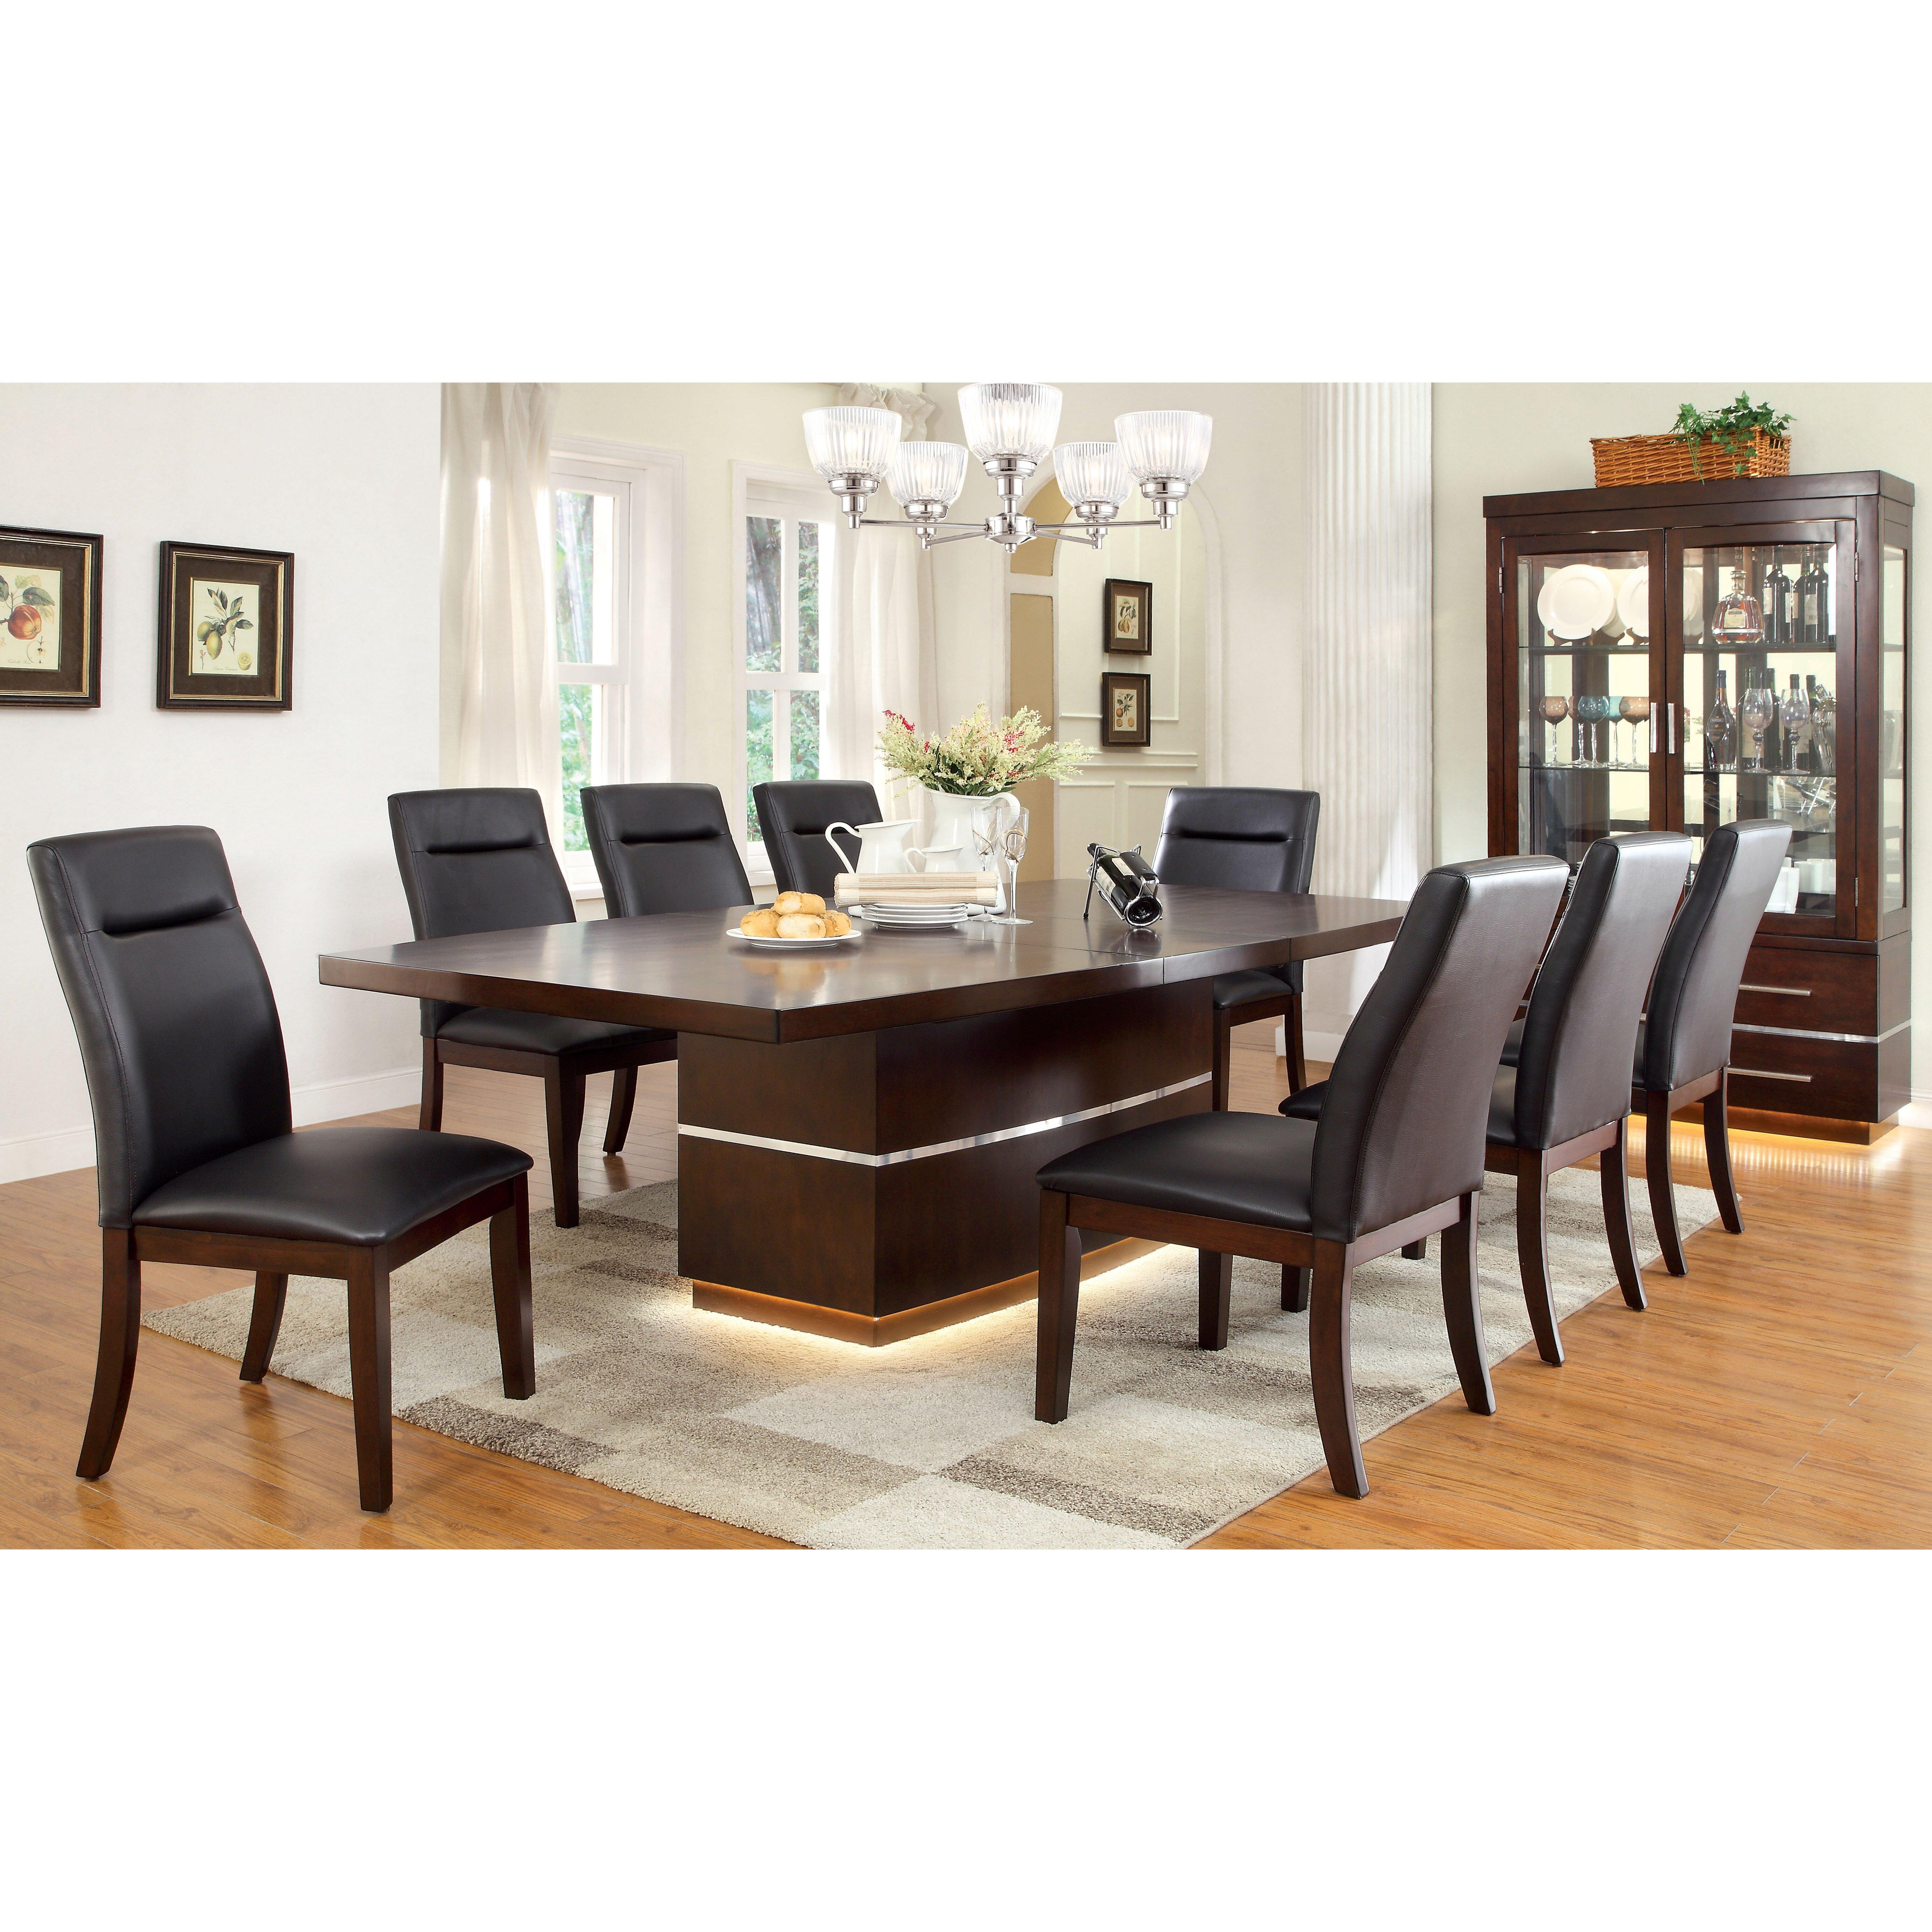 9 piece dining room sets | Hokku Designs Solaare 9 Piece Dining Set & Reviews | Wayfair